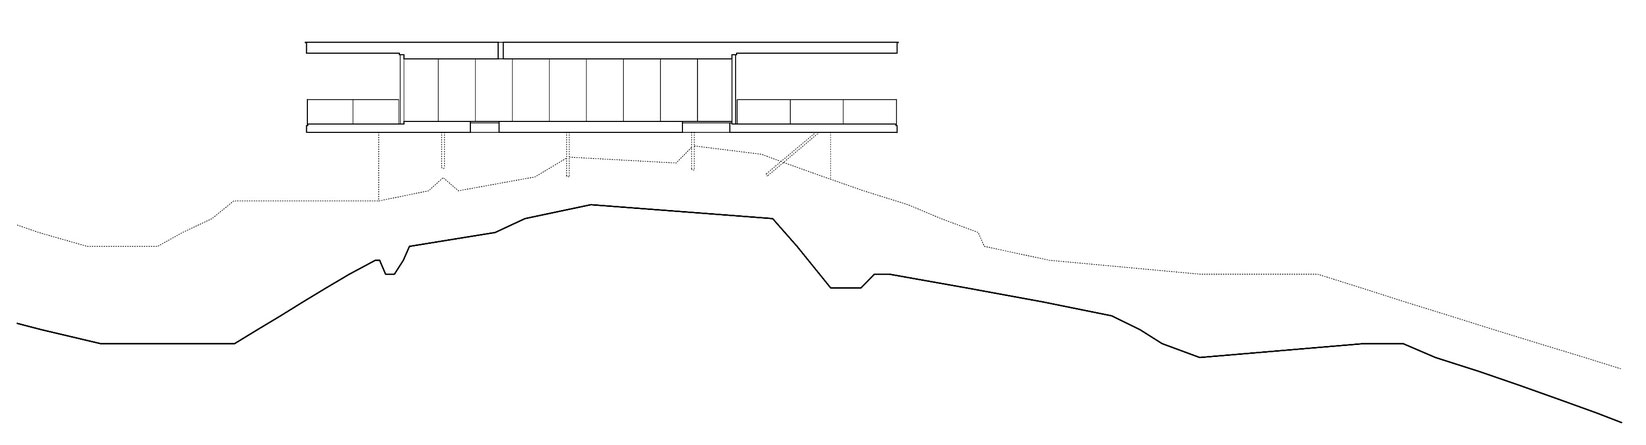 Tula House by Patkau Architects-33